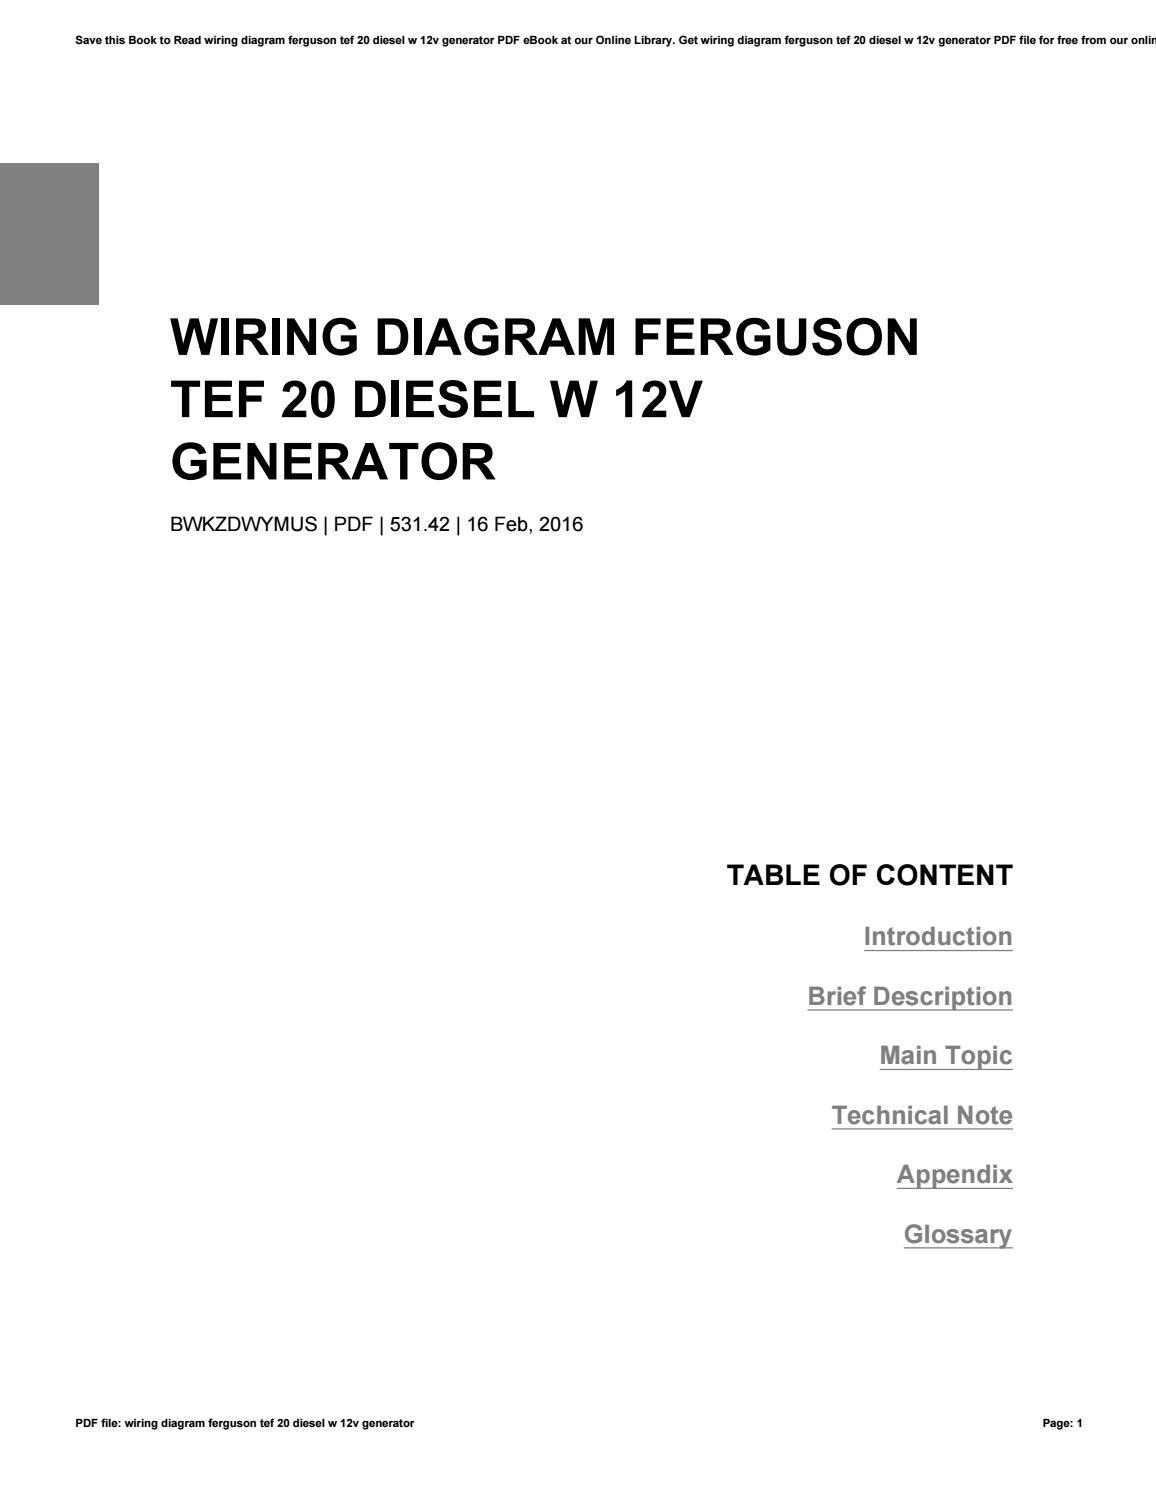 Diagram  Massey Ferguson Generator Wiring Diagram Full